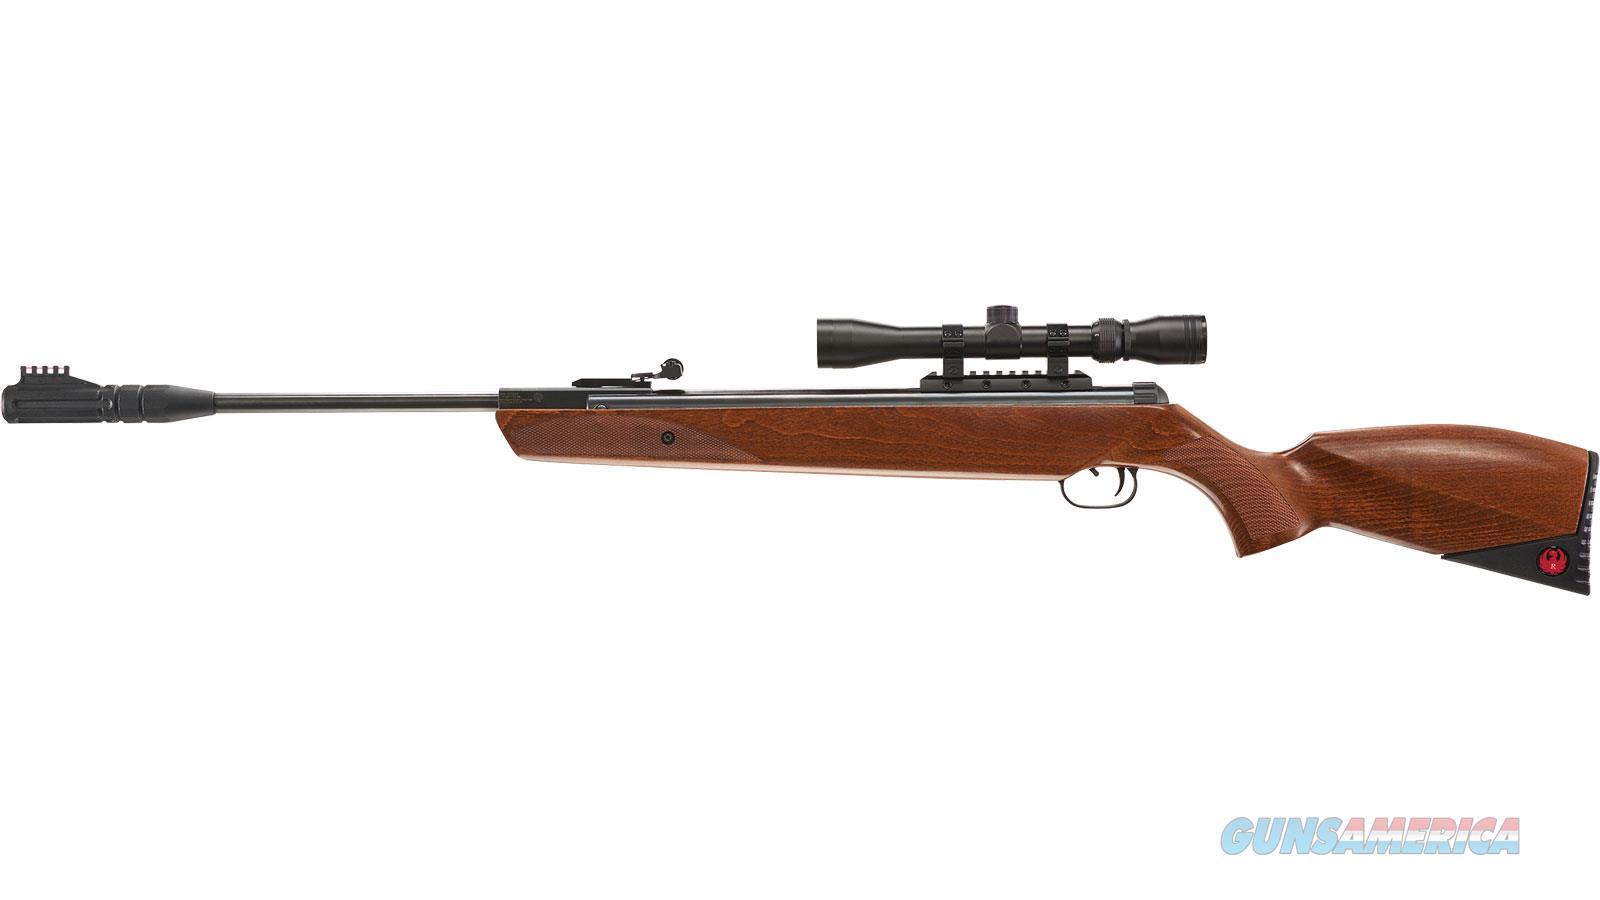 Rws Rug Yukon 177Cal Magnum Combo 3-9X32 Scp 2244229  Non-Guns > Air Rifles - Pistols > Other